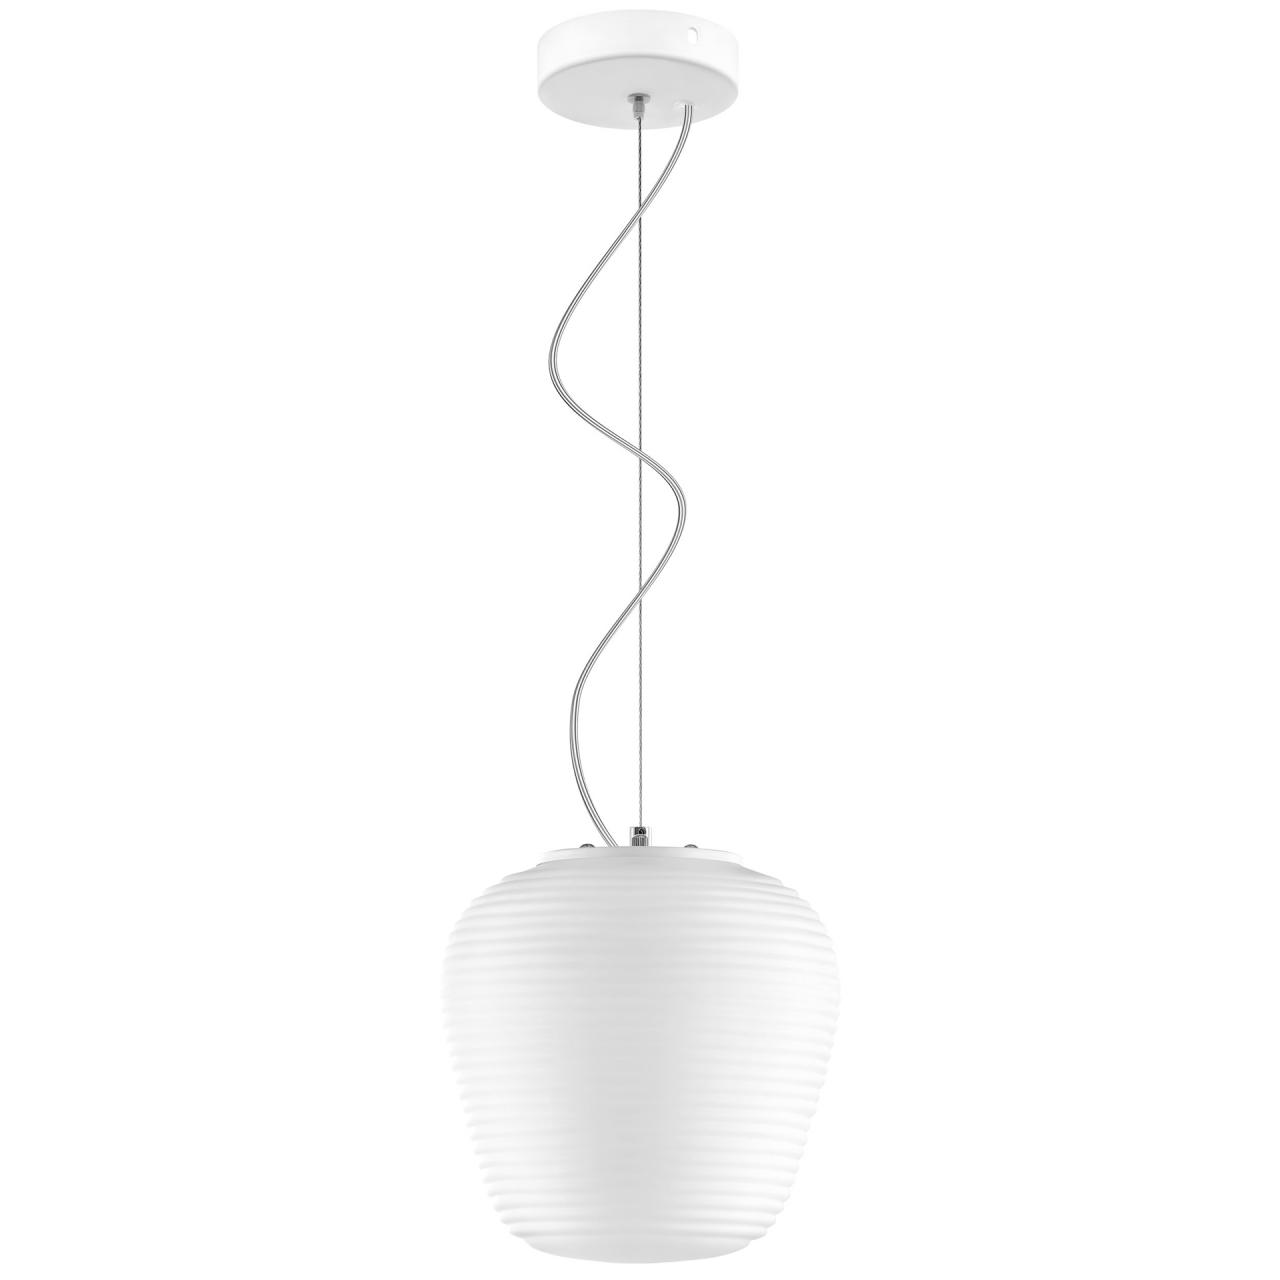 Люстра подвесная Arnia 1Х40W E27 Белый Lightstar 805011